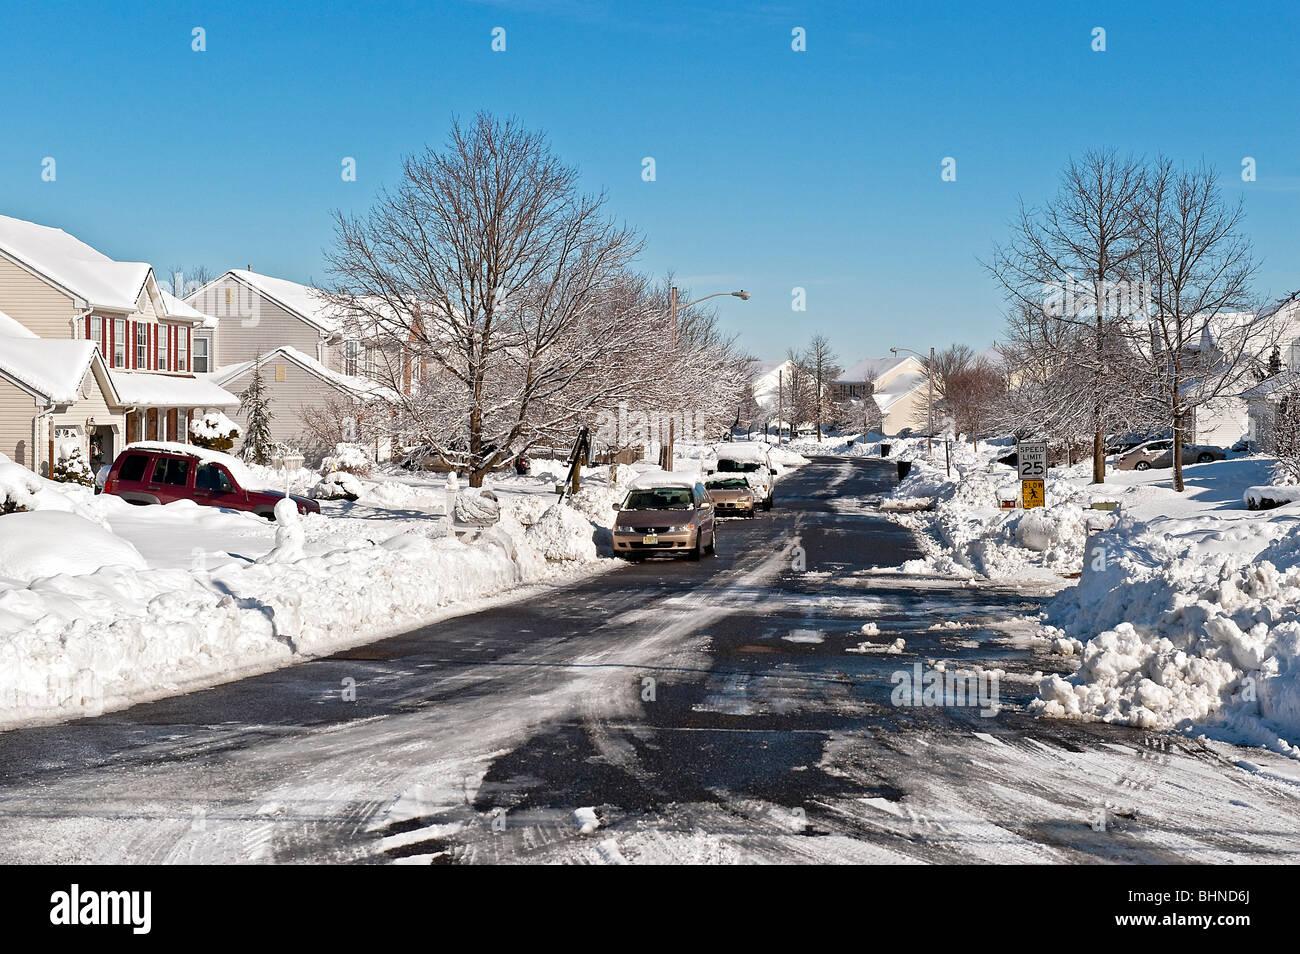 Snow bound suburban housing development. - Stock Image